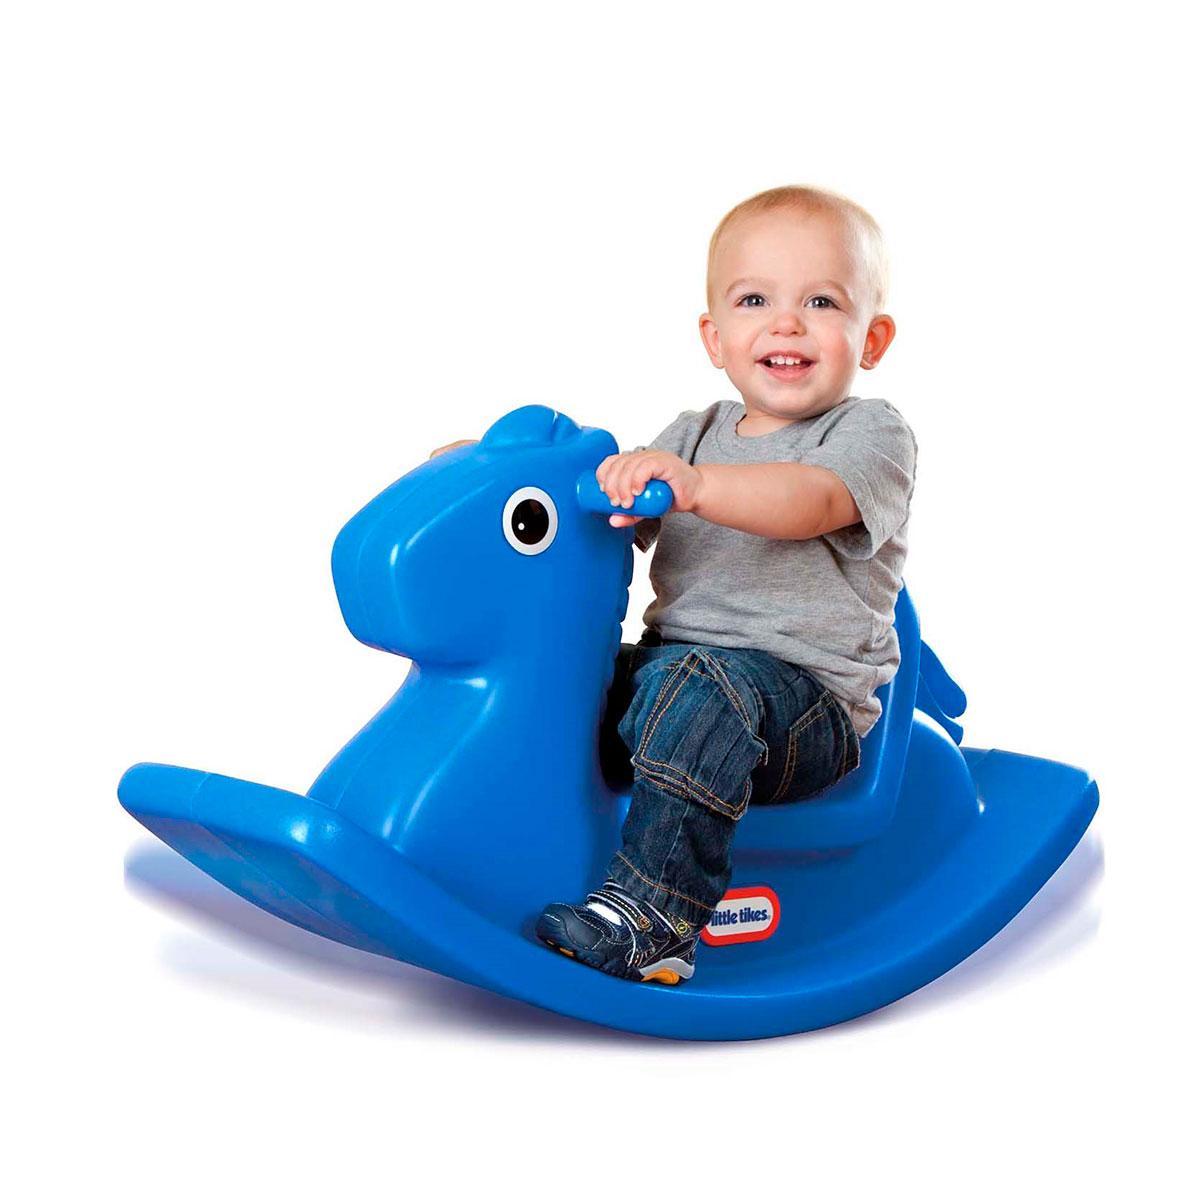 Качалка - Веселая лошадка S2 (синяя) Little Tikes